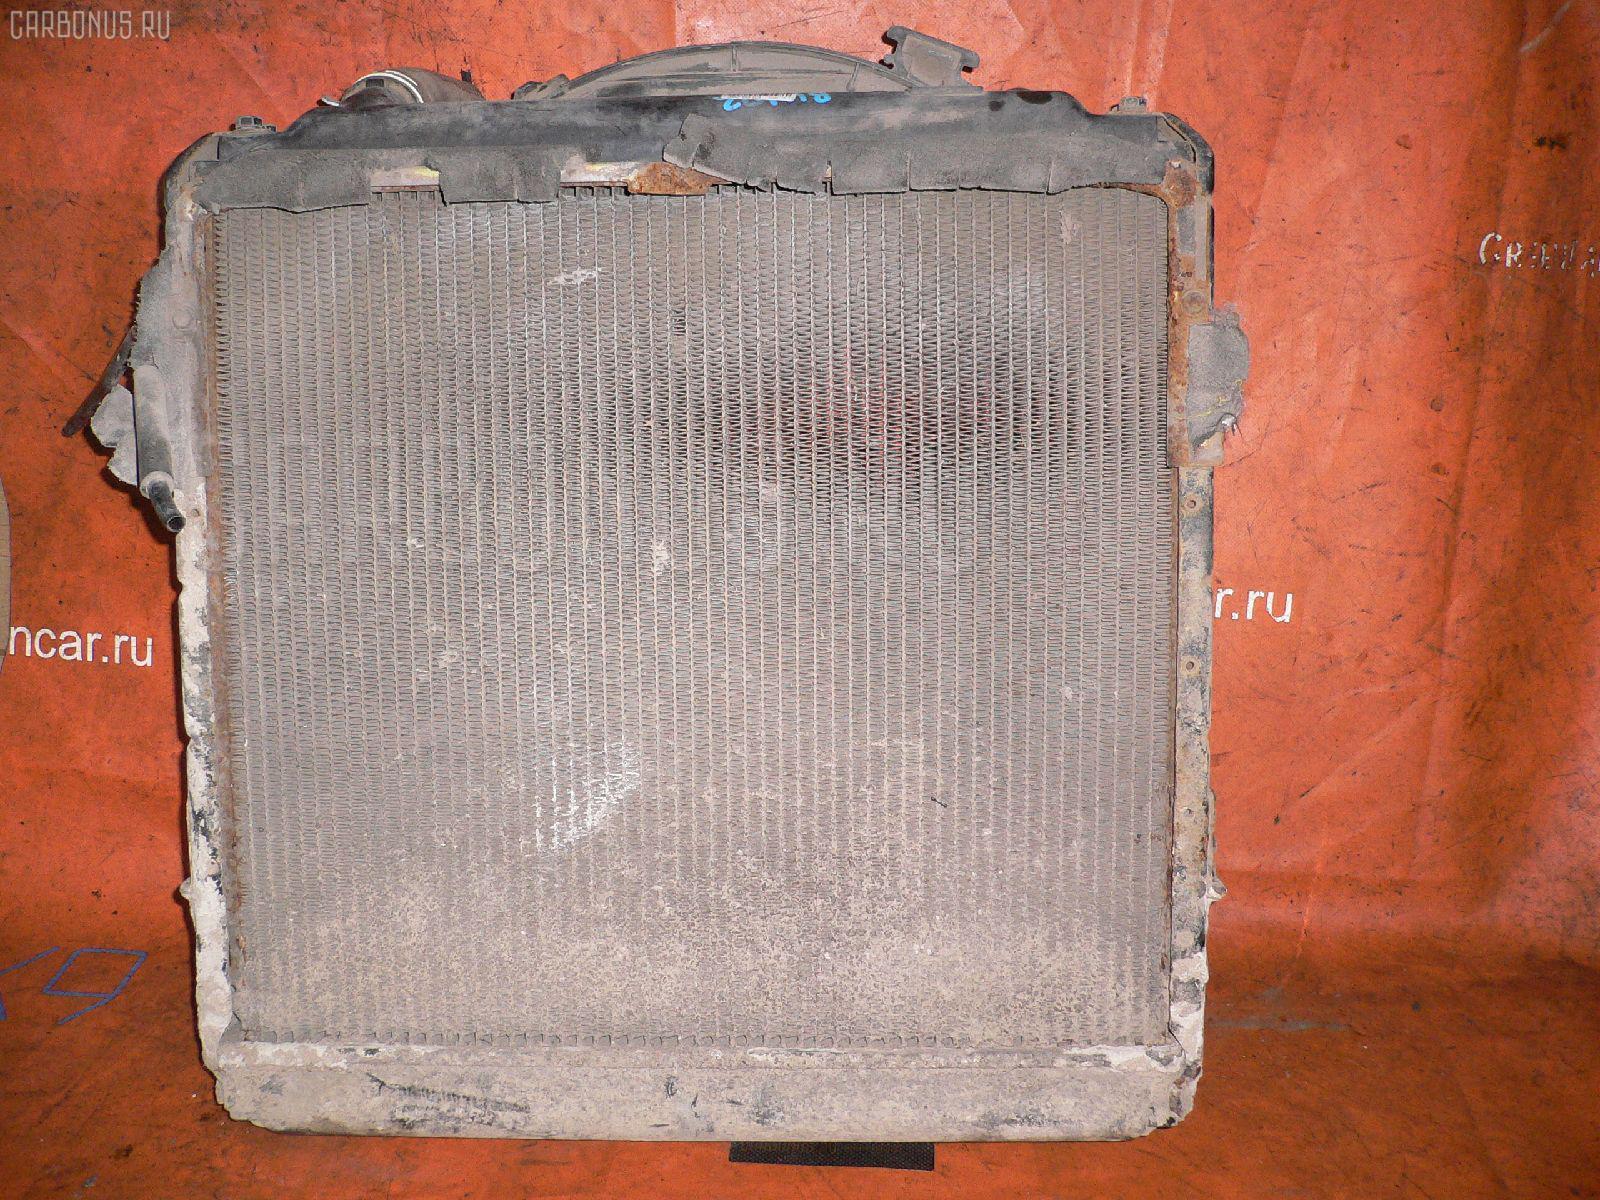 Радиатор ДВС TOYOTA DYNA BU102 15B-F Фото 2